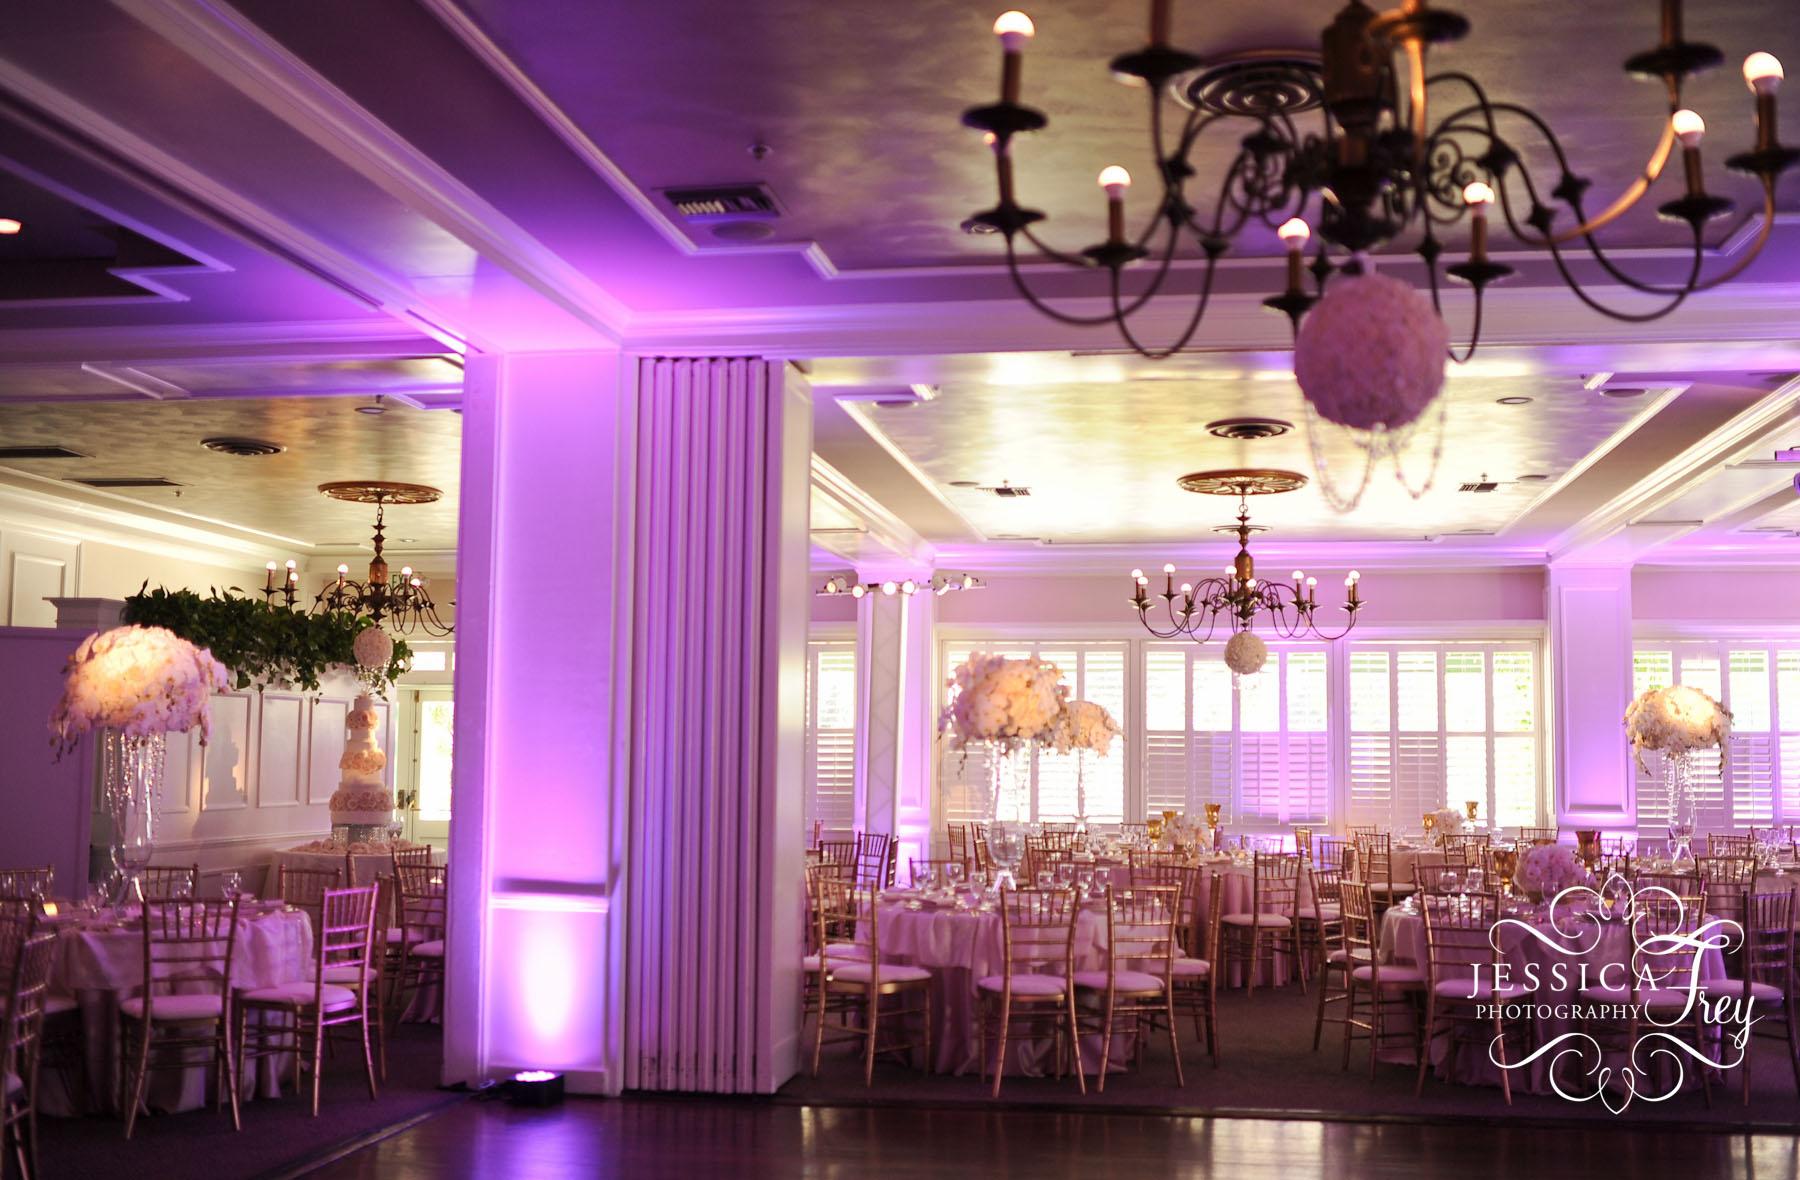 matt morgans blush gold wedding purple and gold wedding Jessica Frey Photography Austin wedding photographer